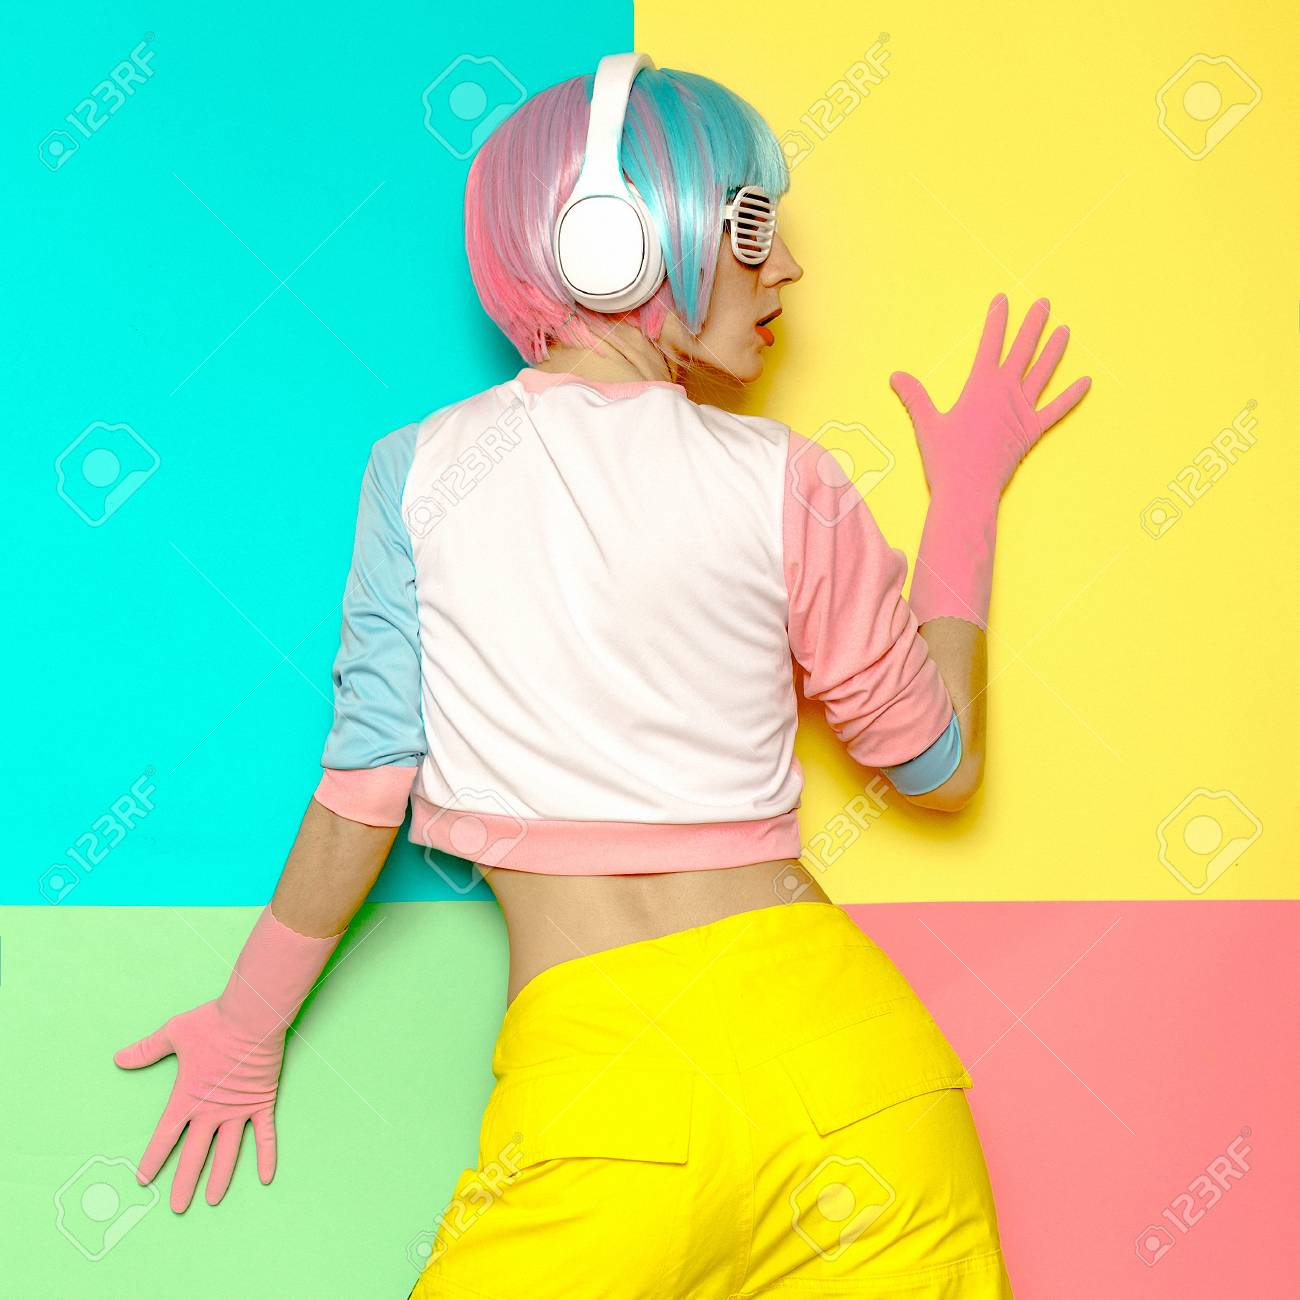 Vanilla DJ Lady. Minimal pop art style. Fashion colors. Sweet party - 74304985